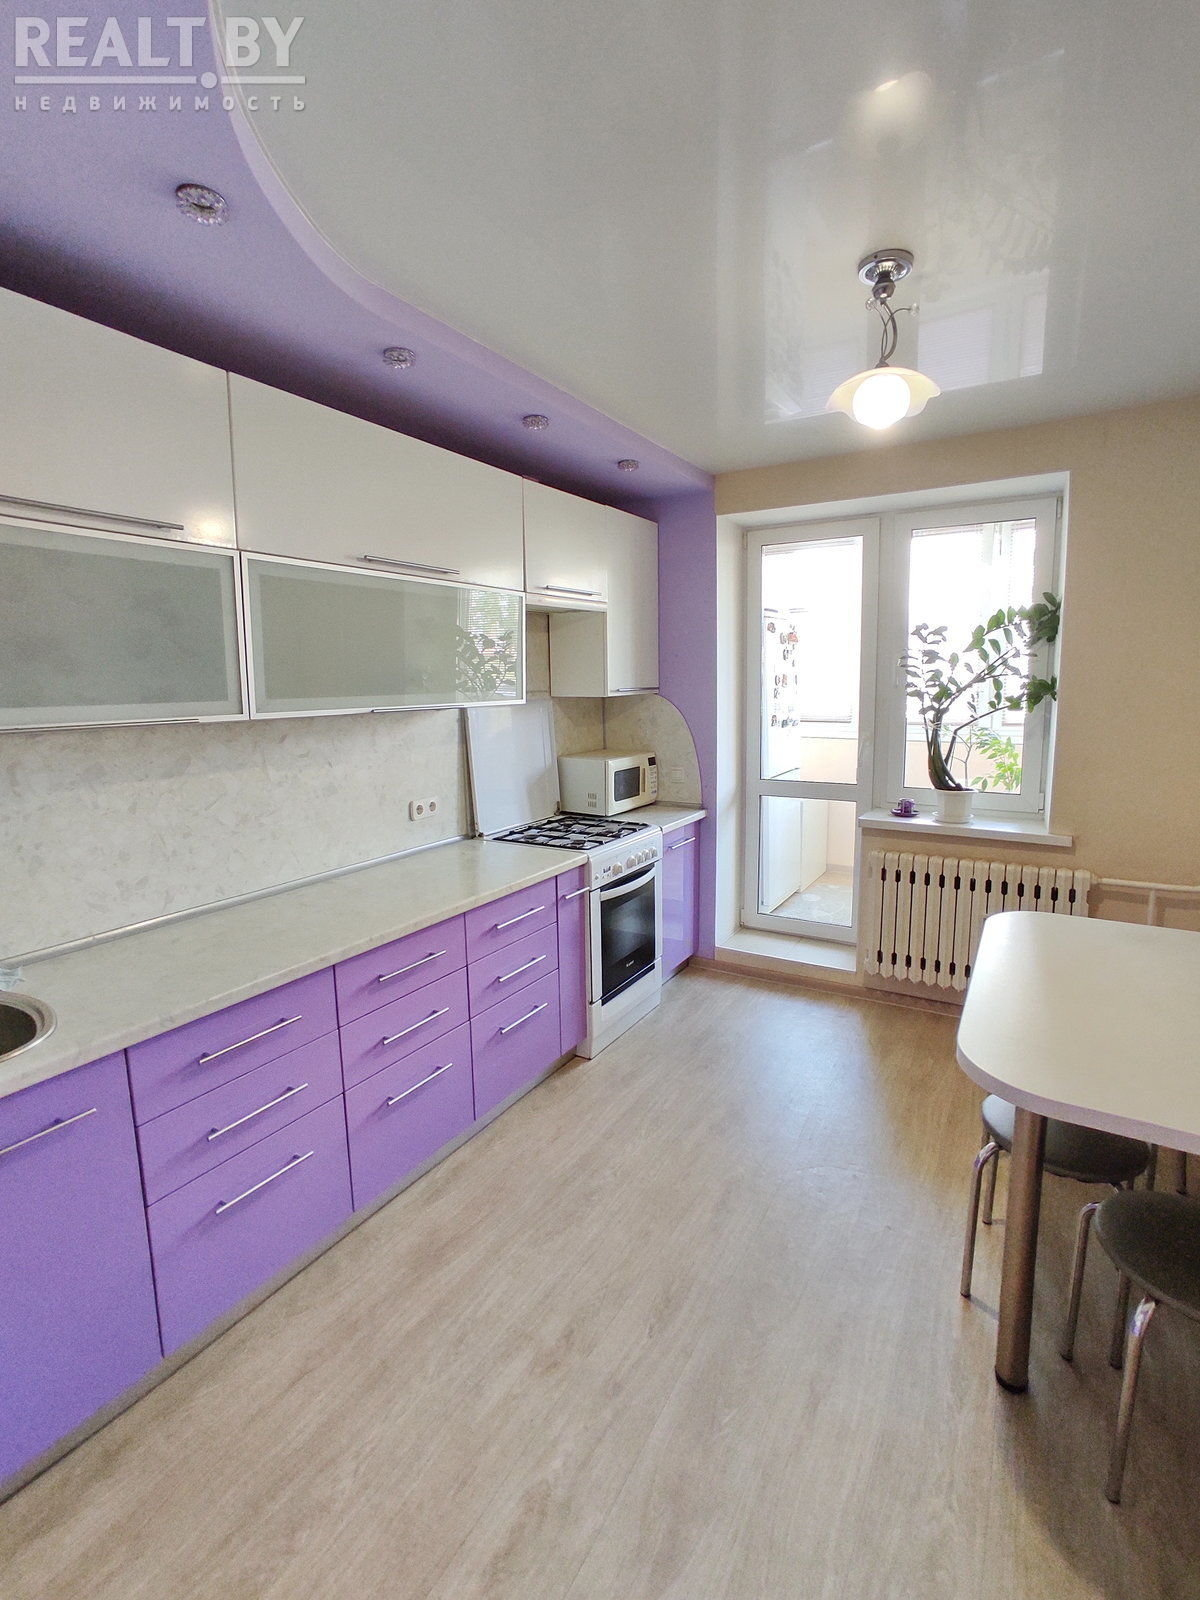 Продается 3-х комнатная квартира, Борисов - фото №6